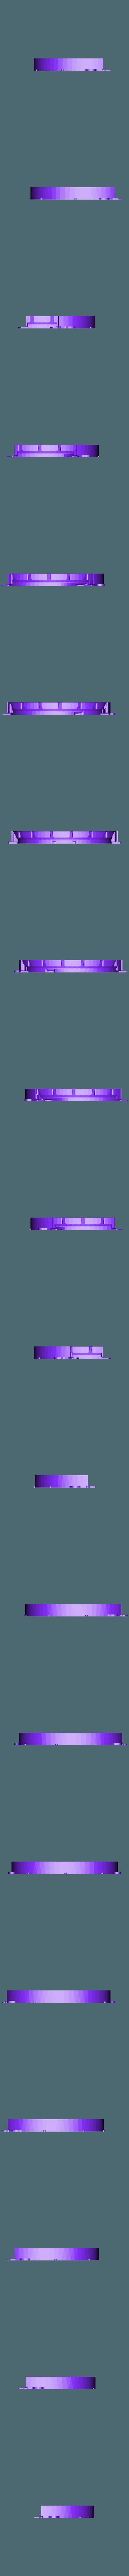 viseramamam.stl Download free STL file visor • 3D printable model, izanferrco